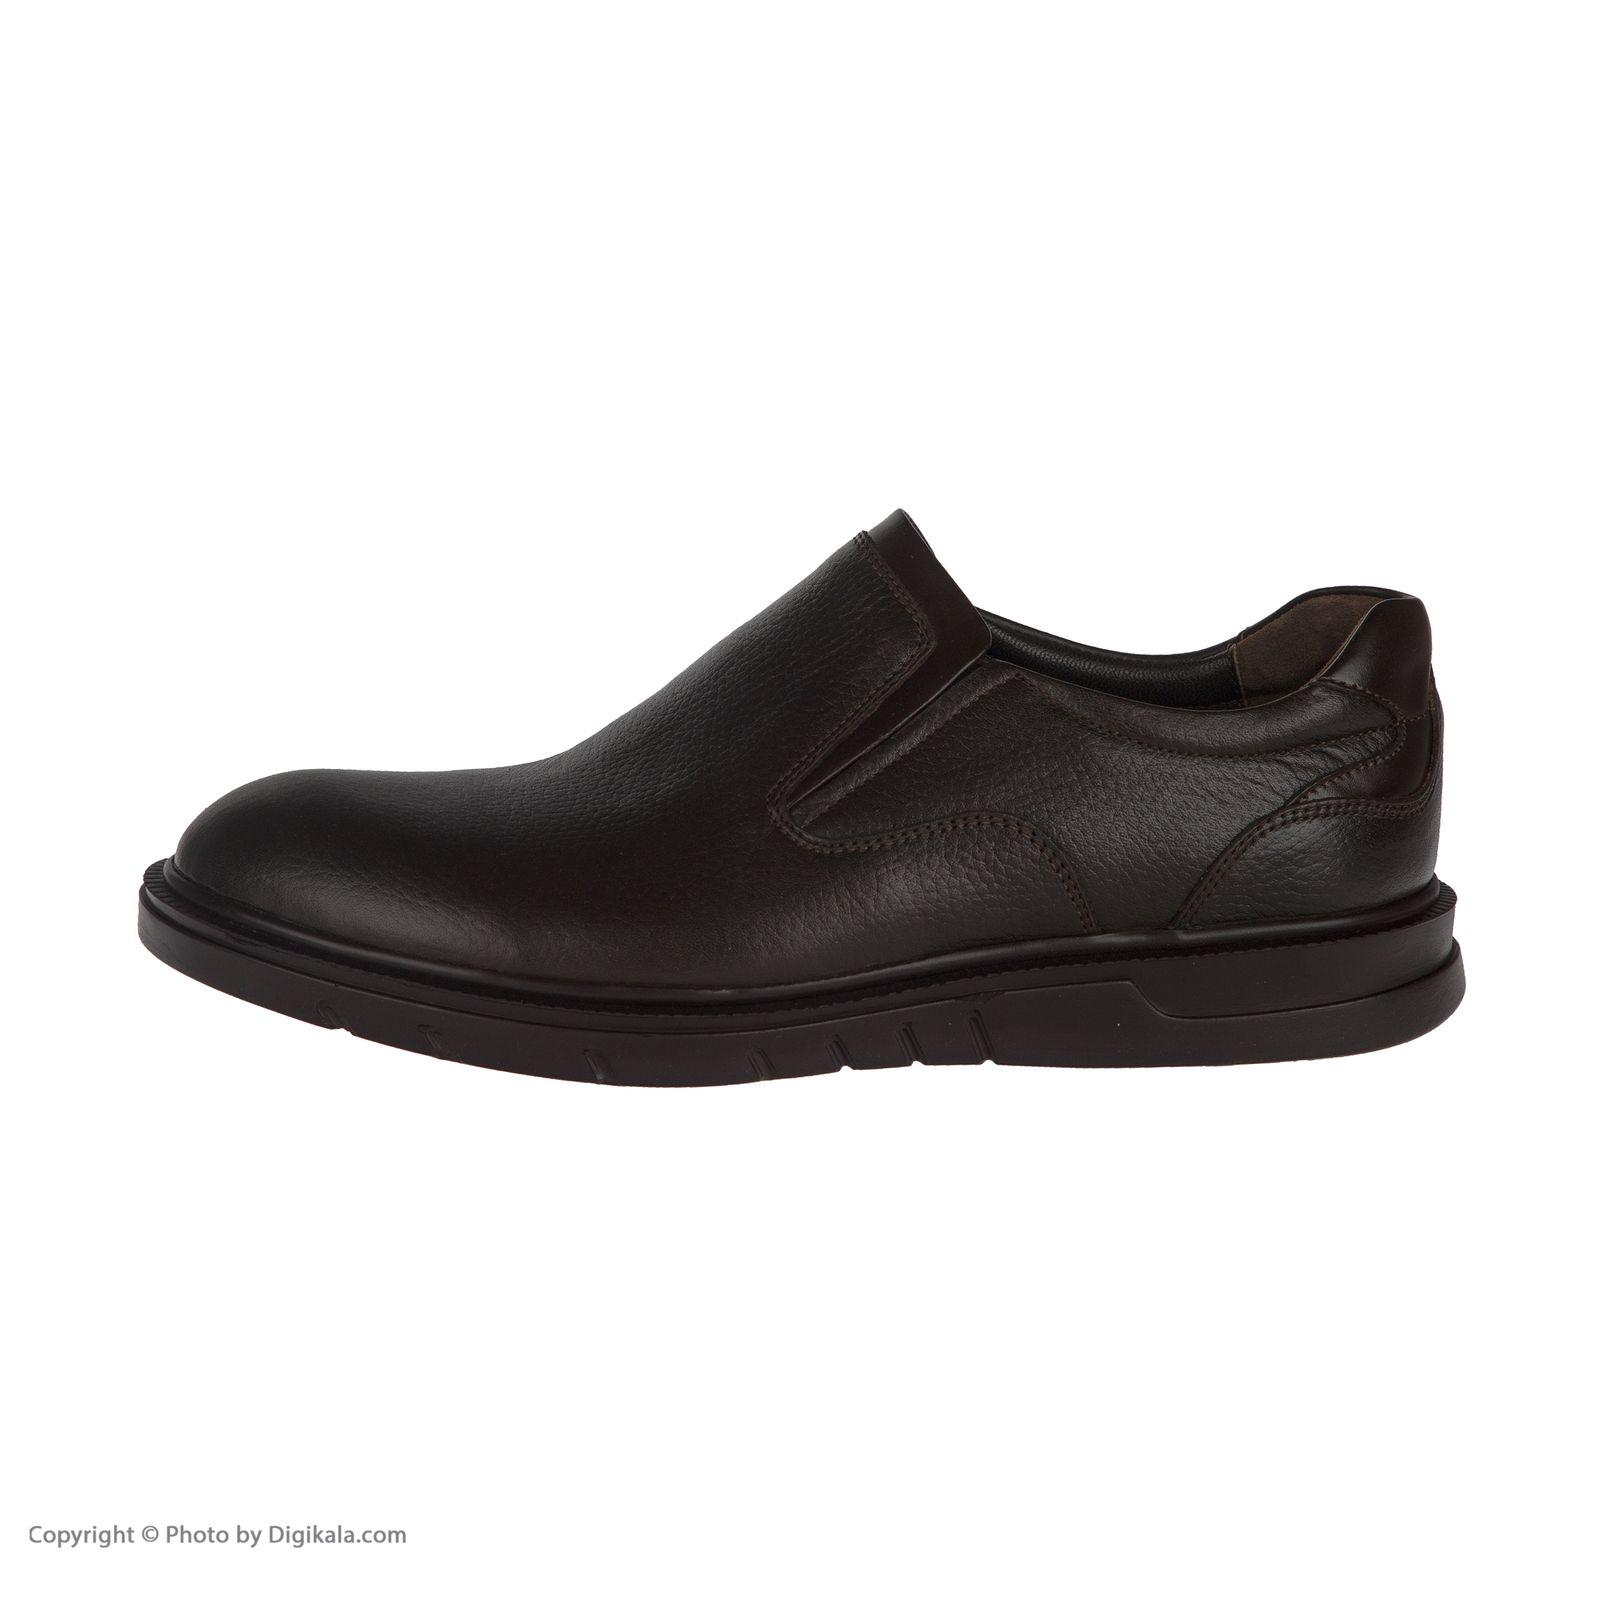 کفش روزمره مردانه بلوط مدل 7240C503104 -  - 3